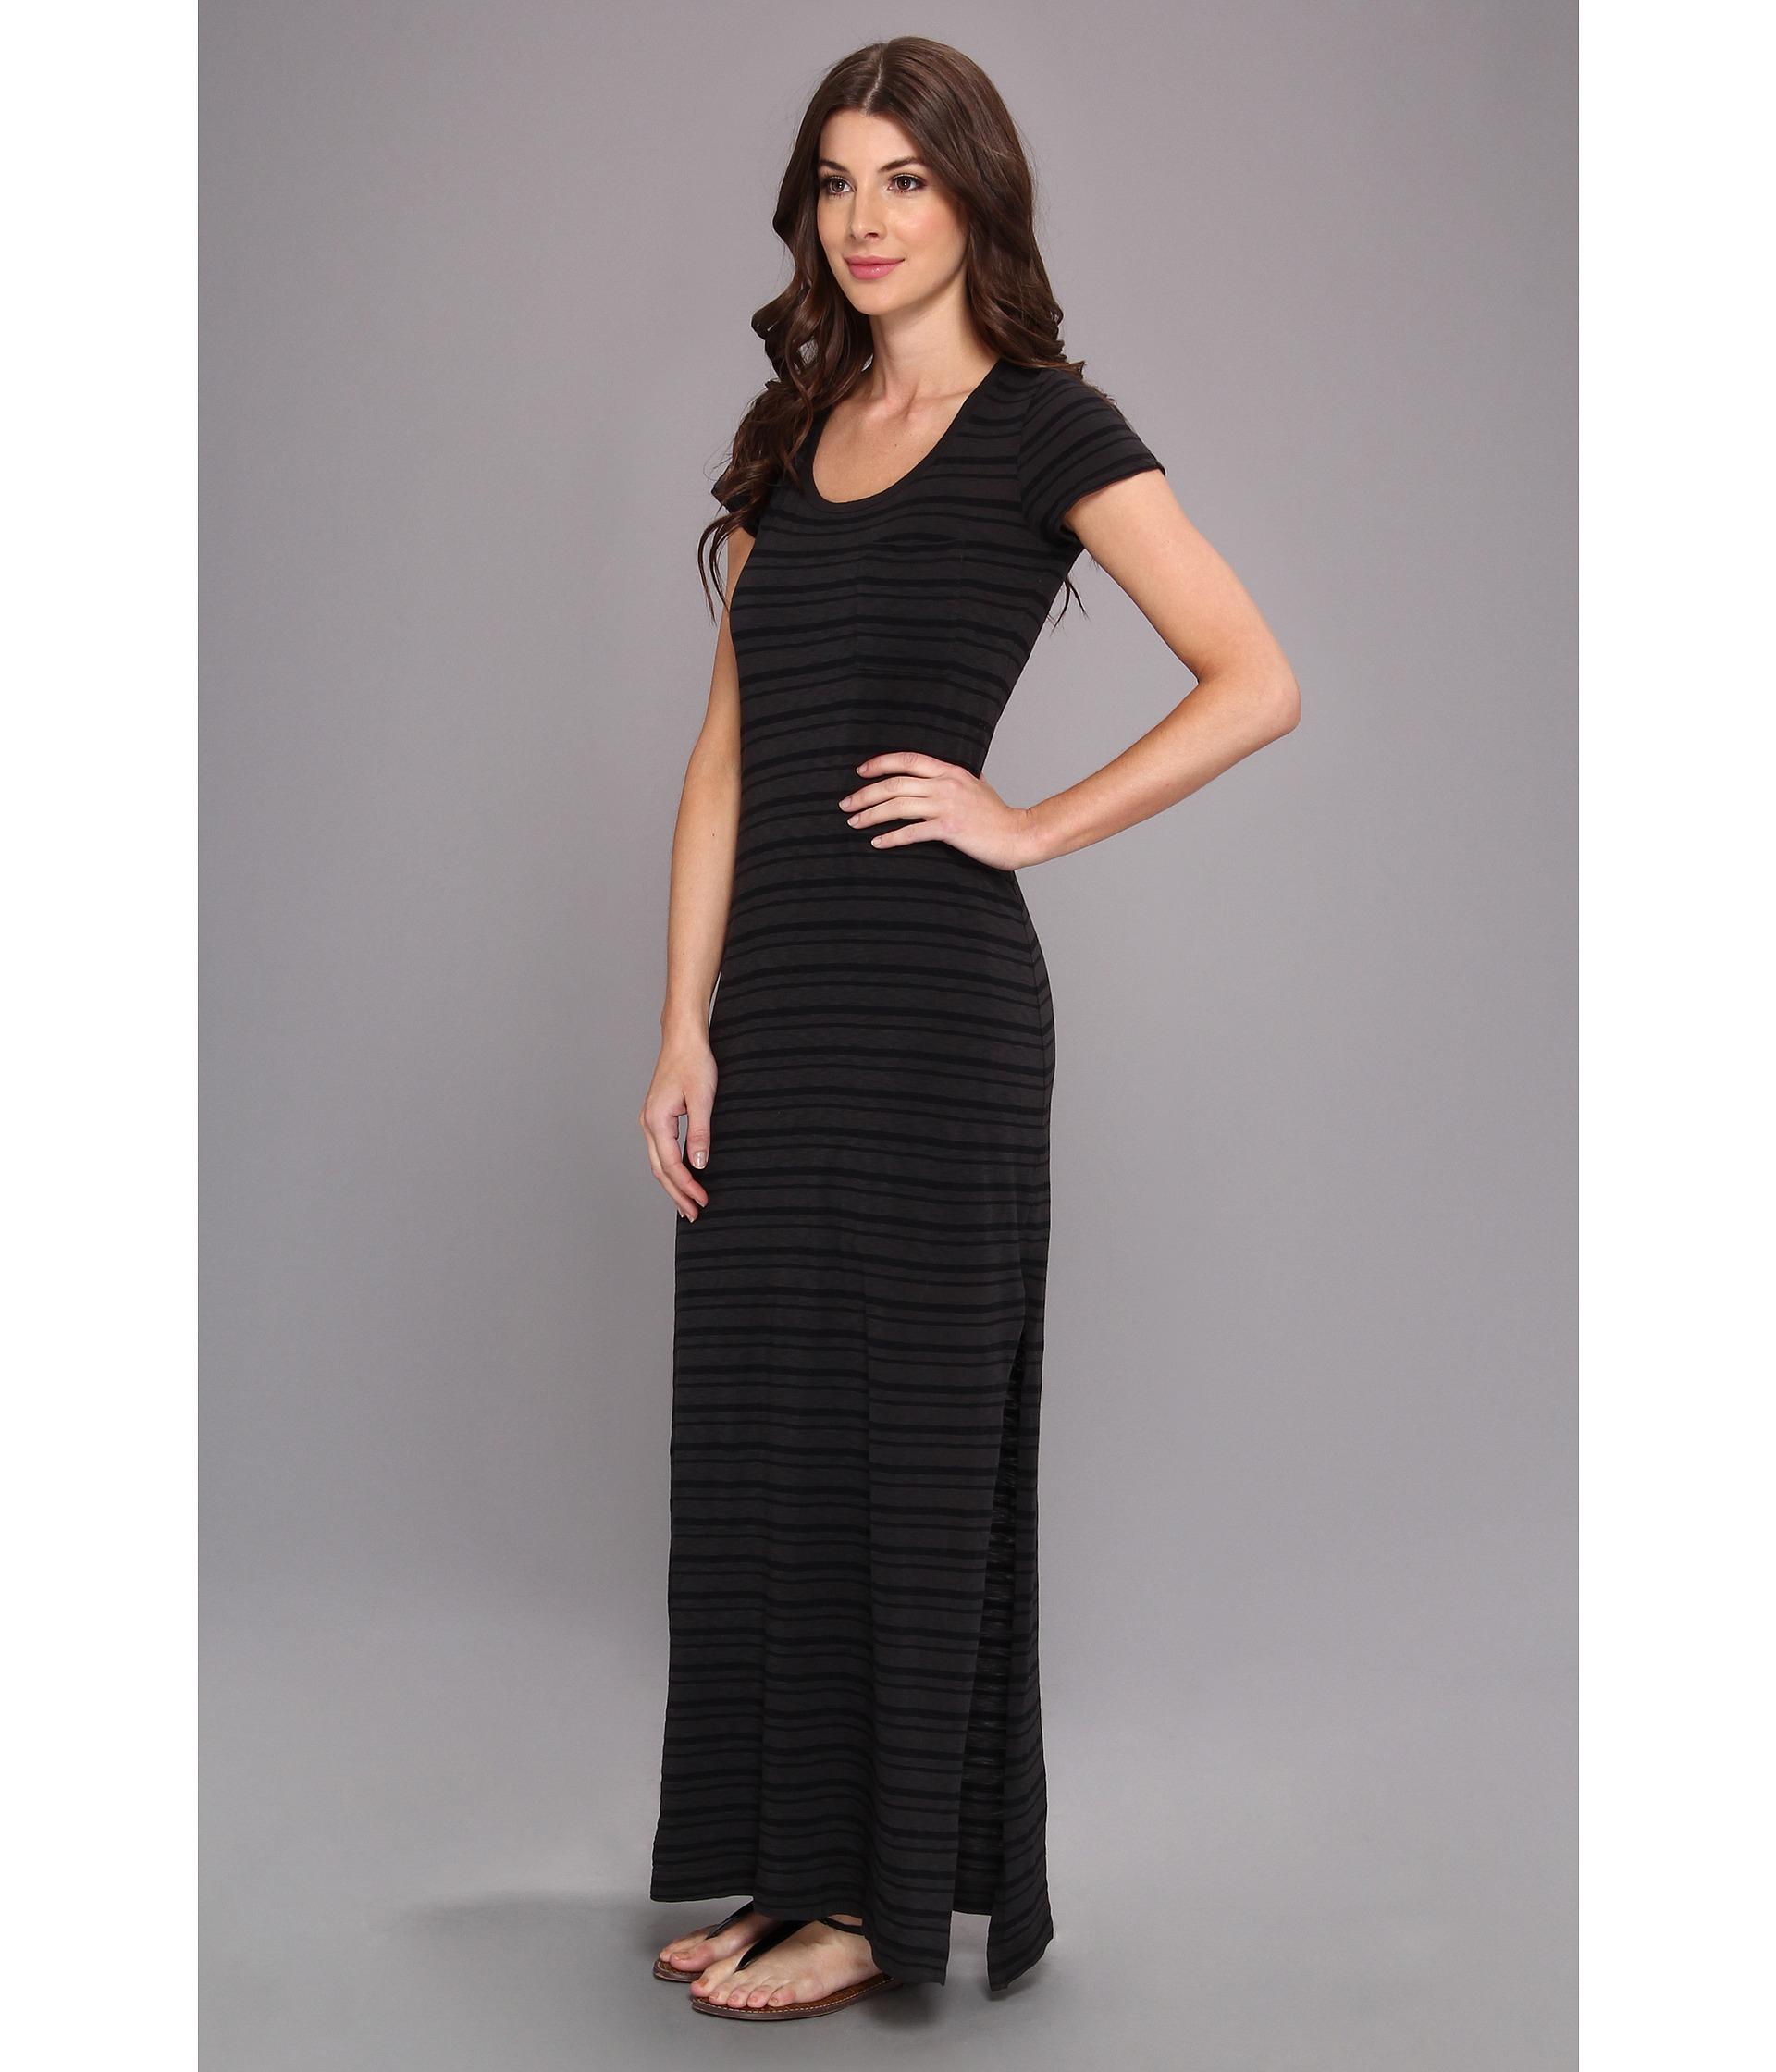 46ba6bd810f T Shirt Maxi Dress With Side Slits